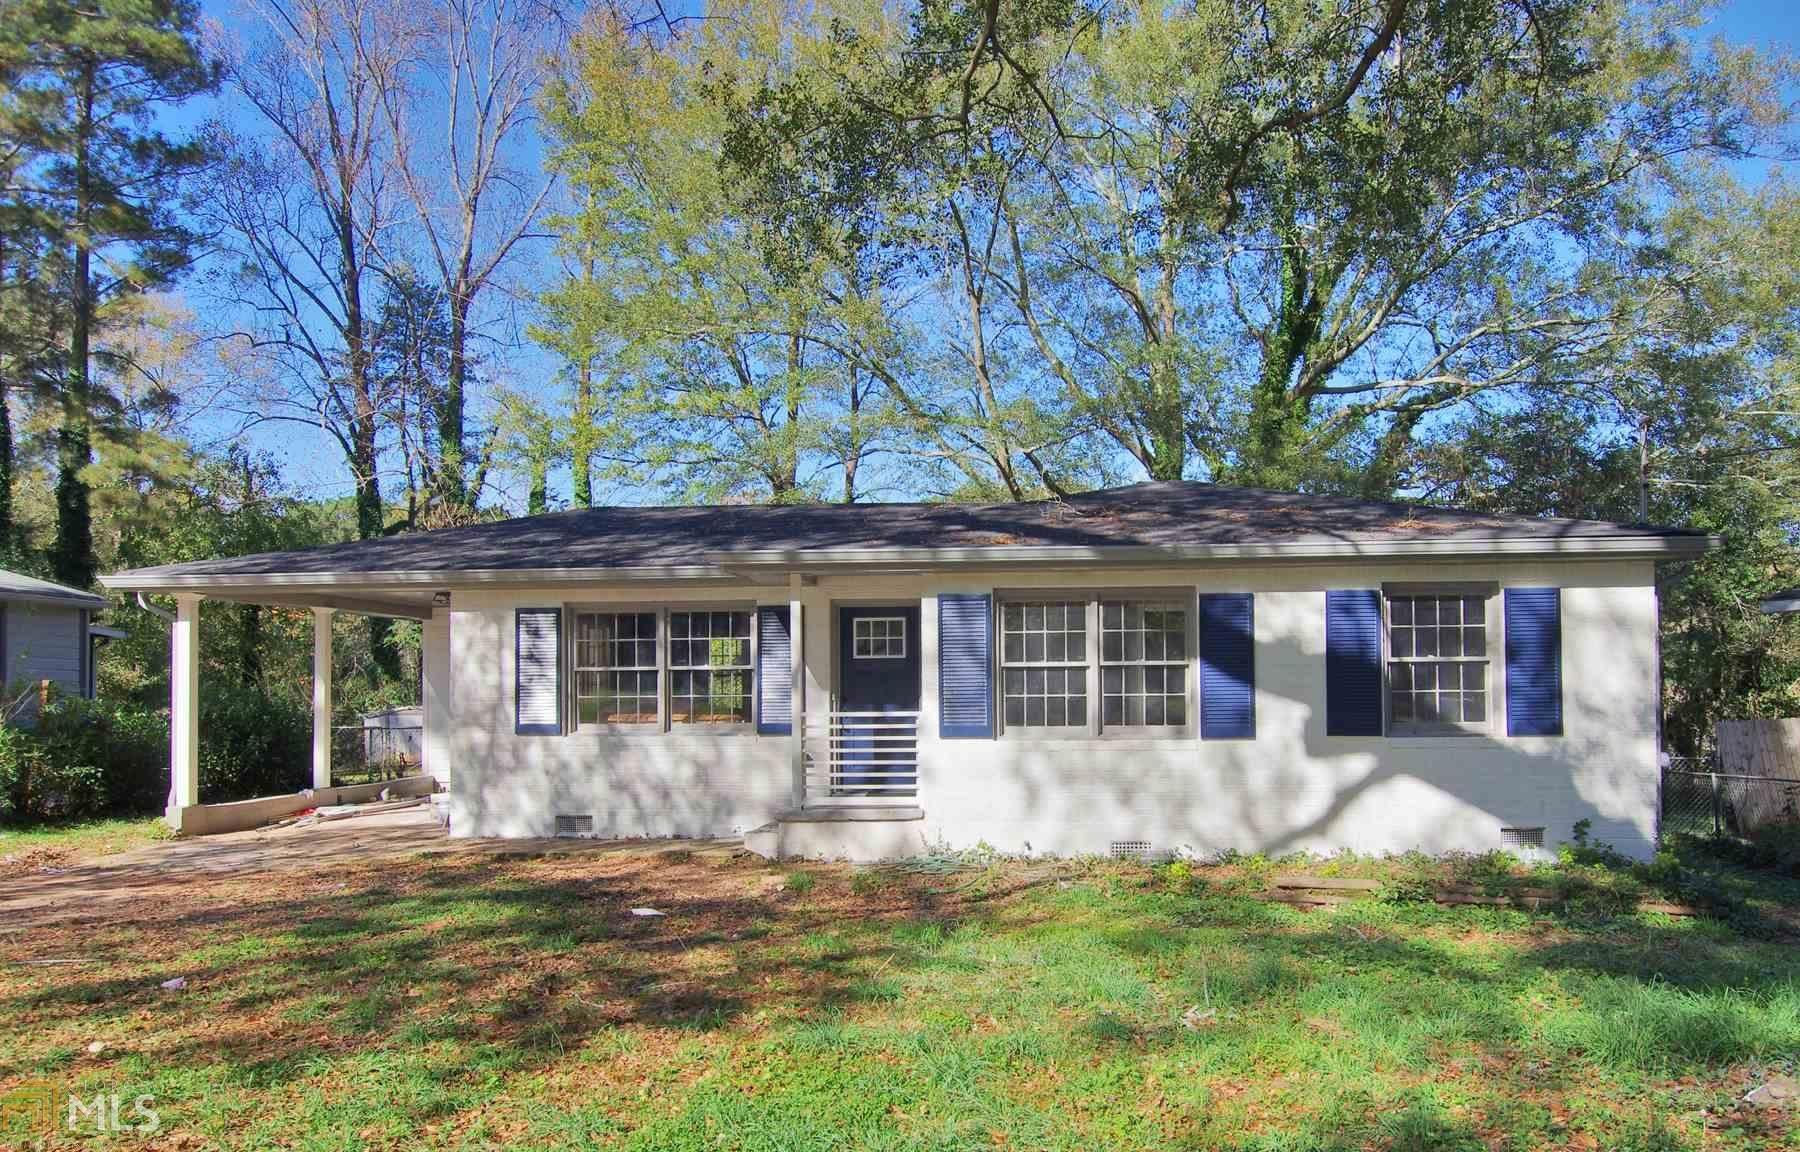 3212 Bluebird Ln, Decatur, GA 30032 - MLS#: 8891577